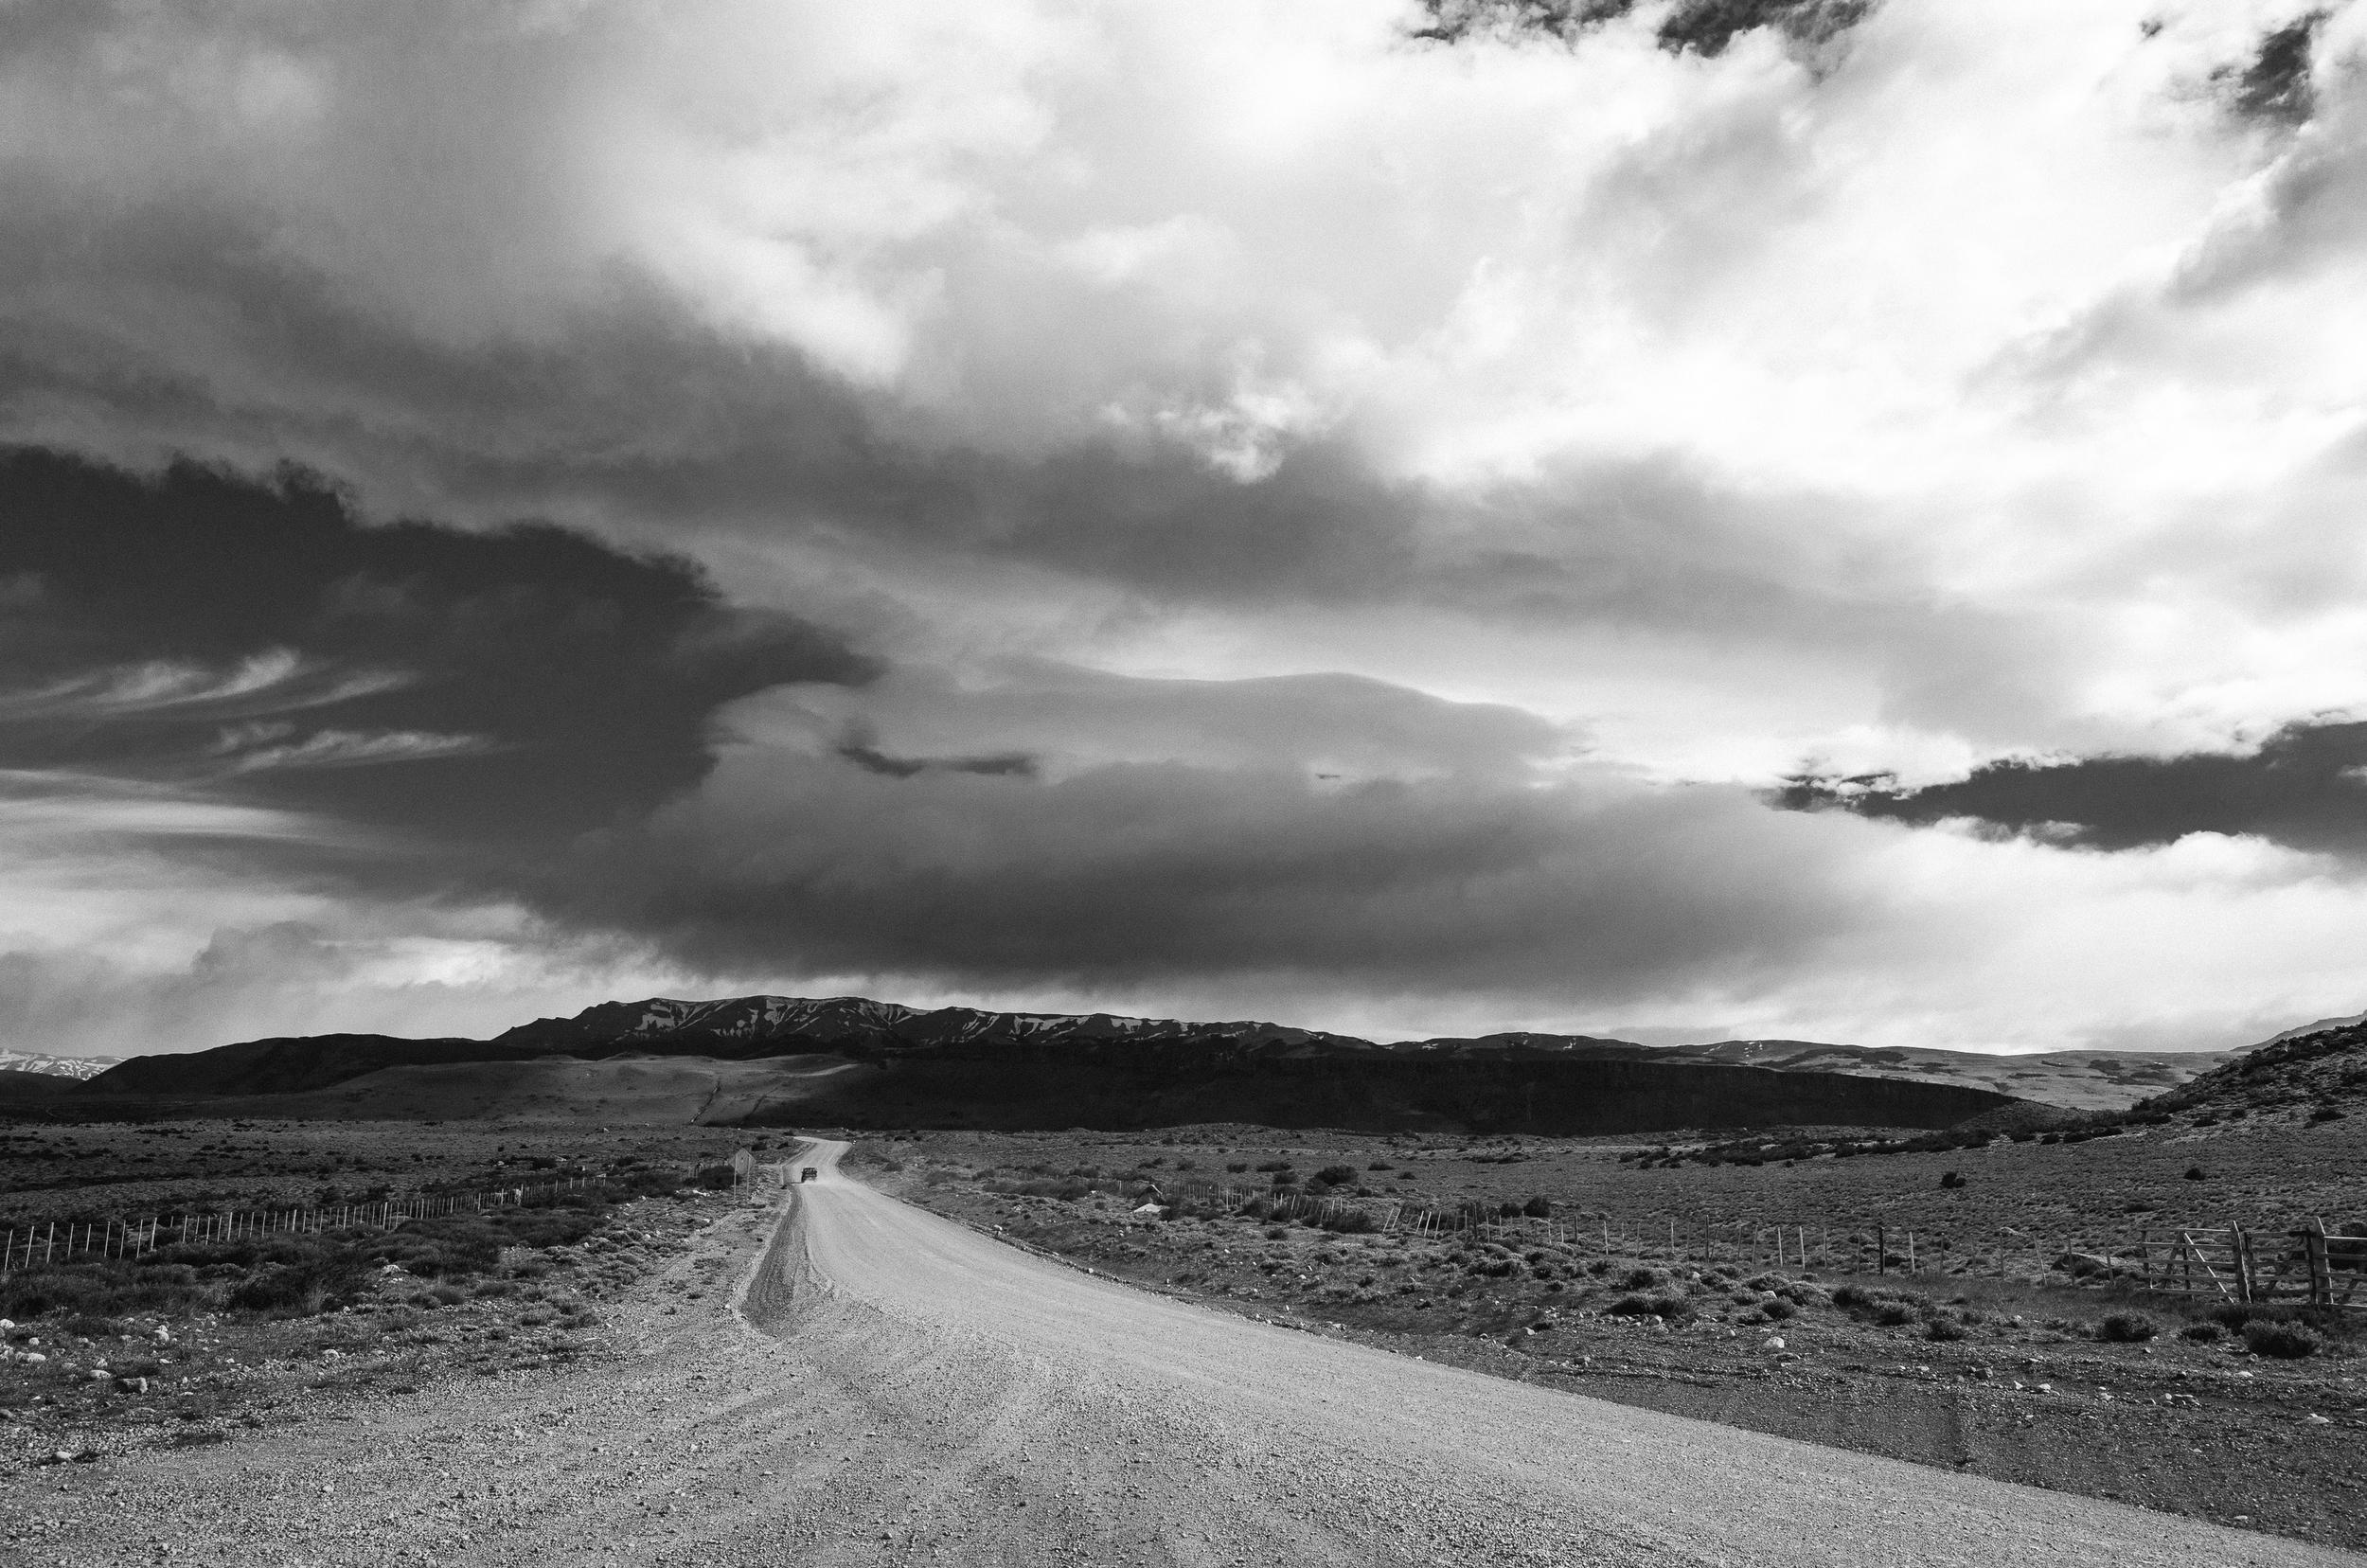 patagonia-2.jpg